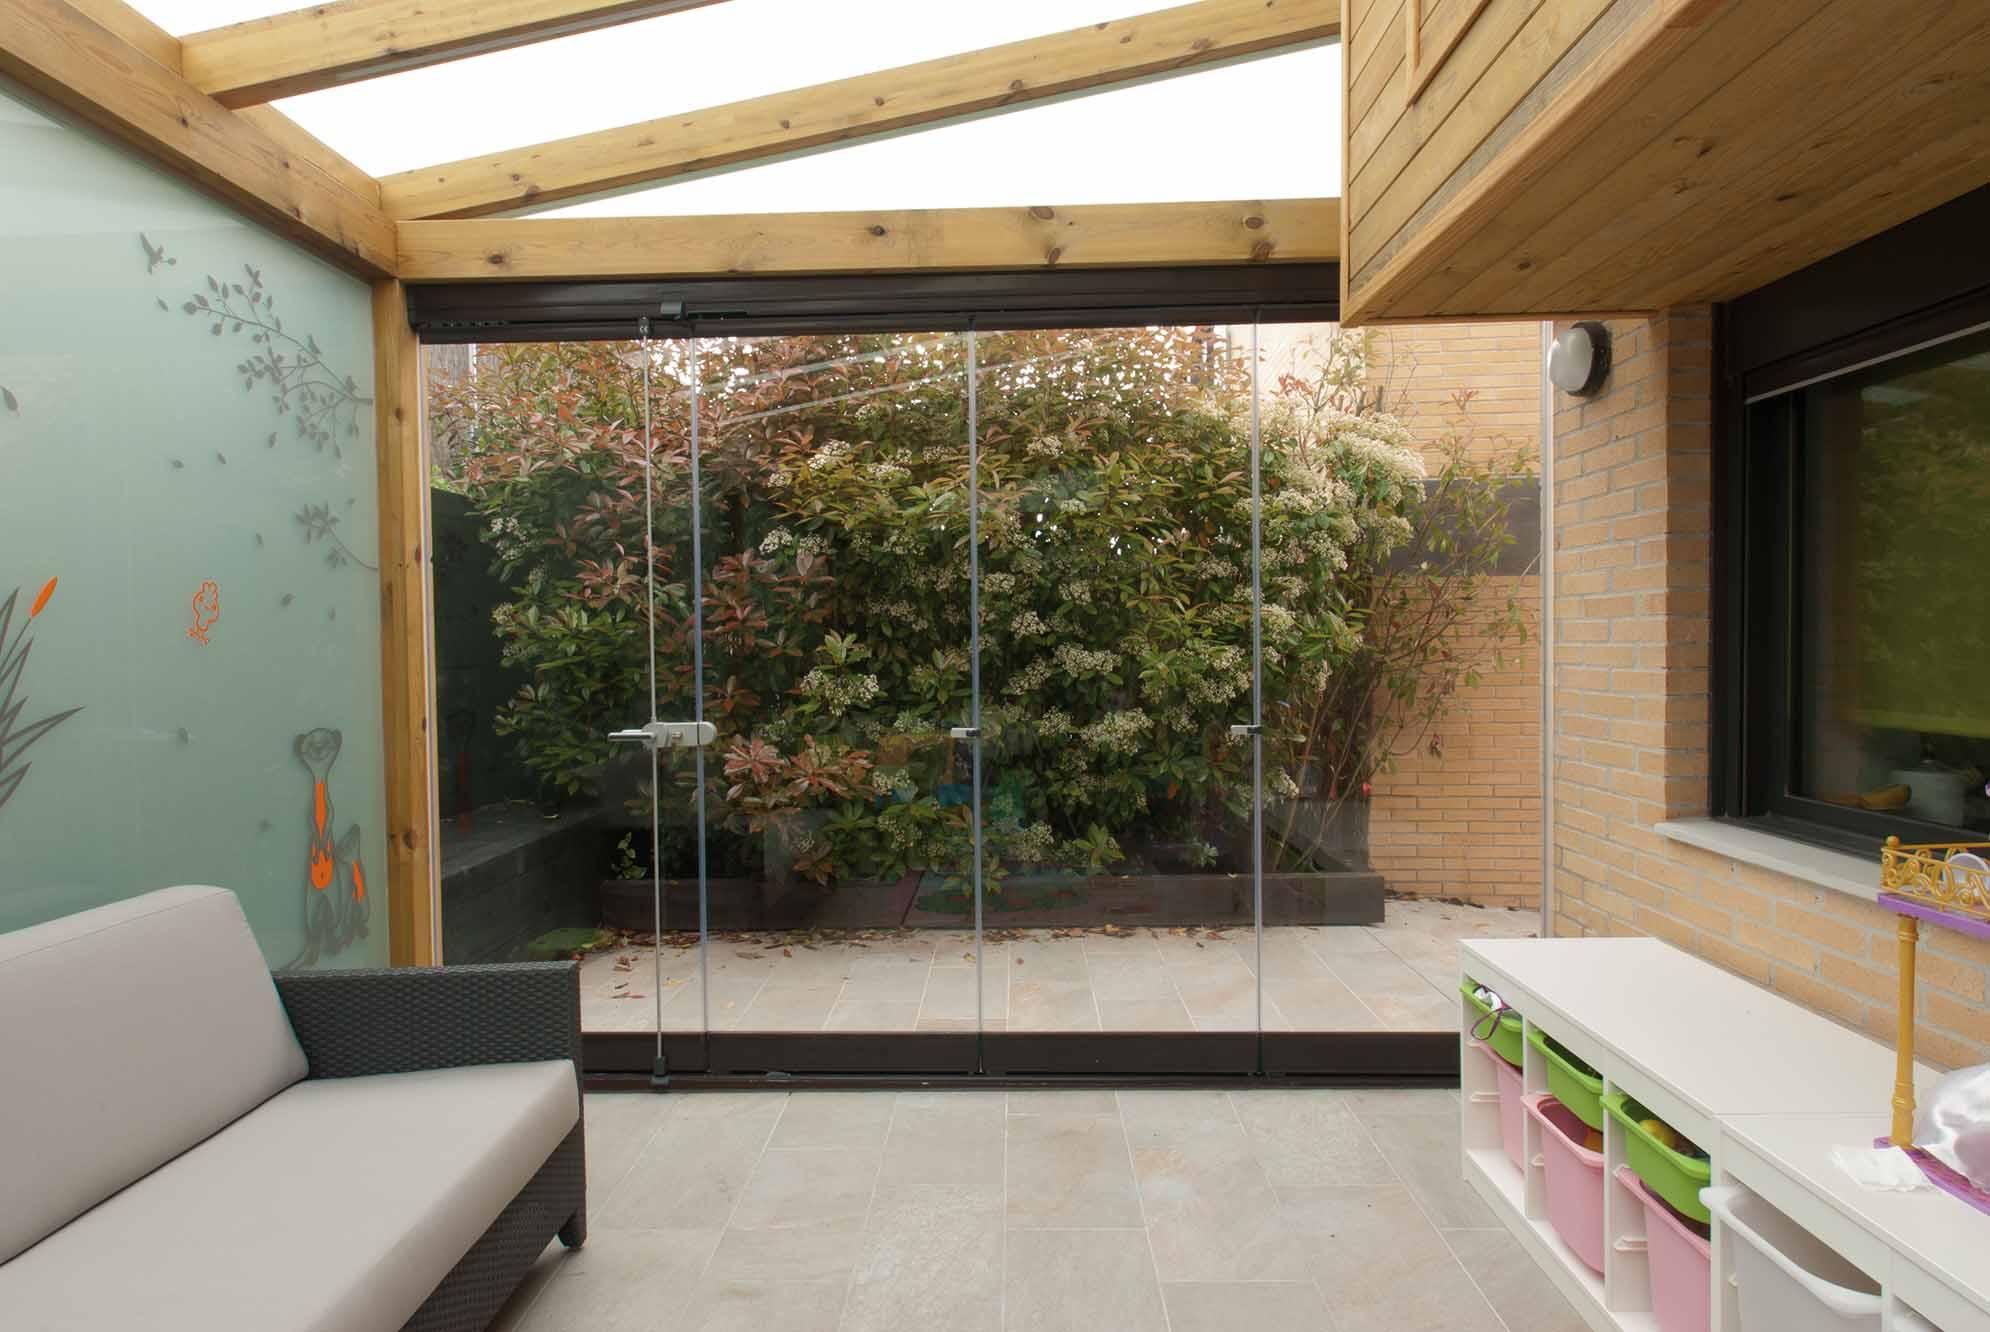 2 cortinas de cristal en porche de madera echarri for Porche jardin madera